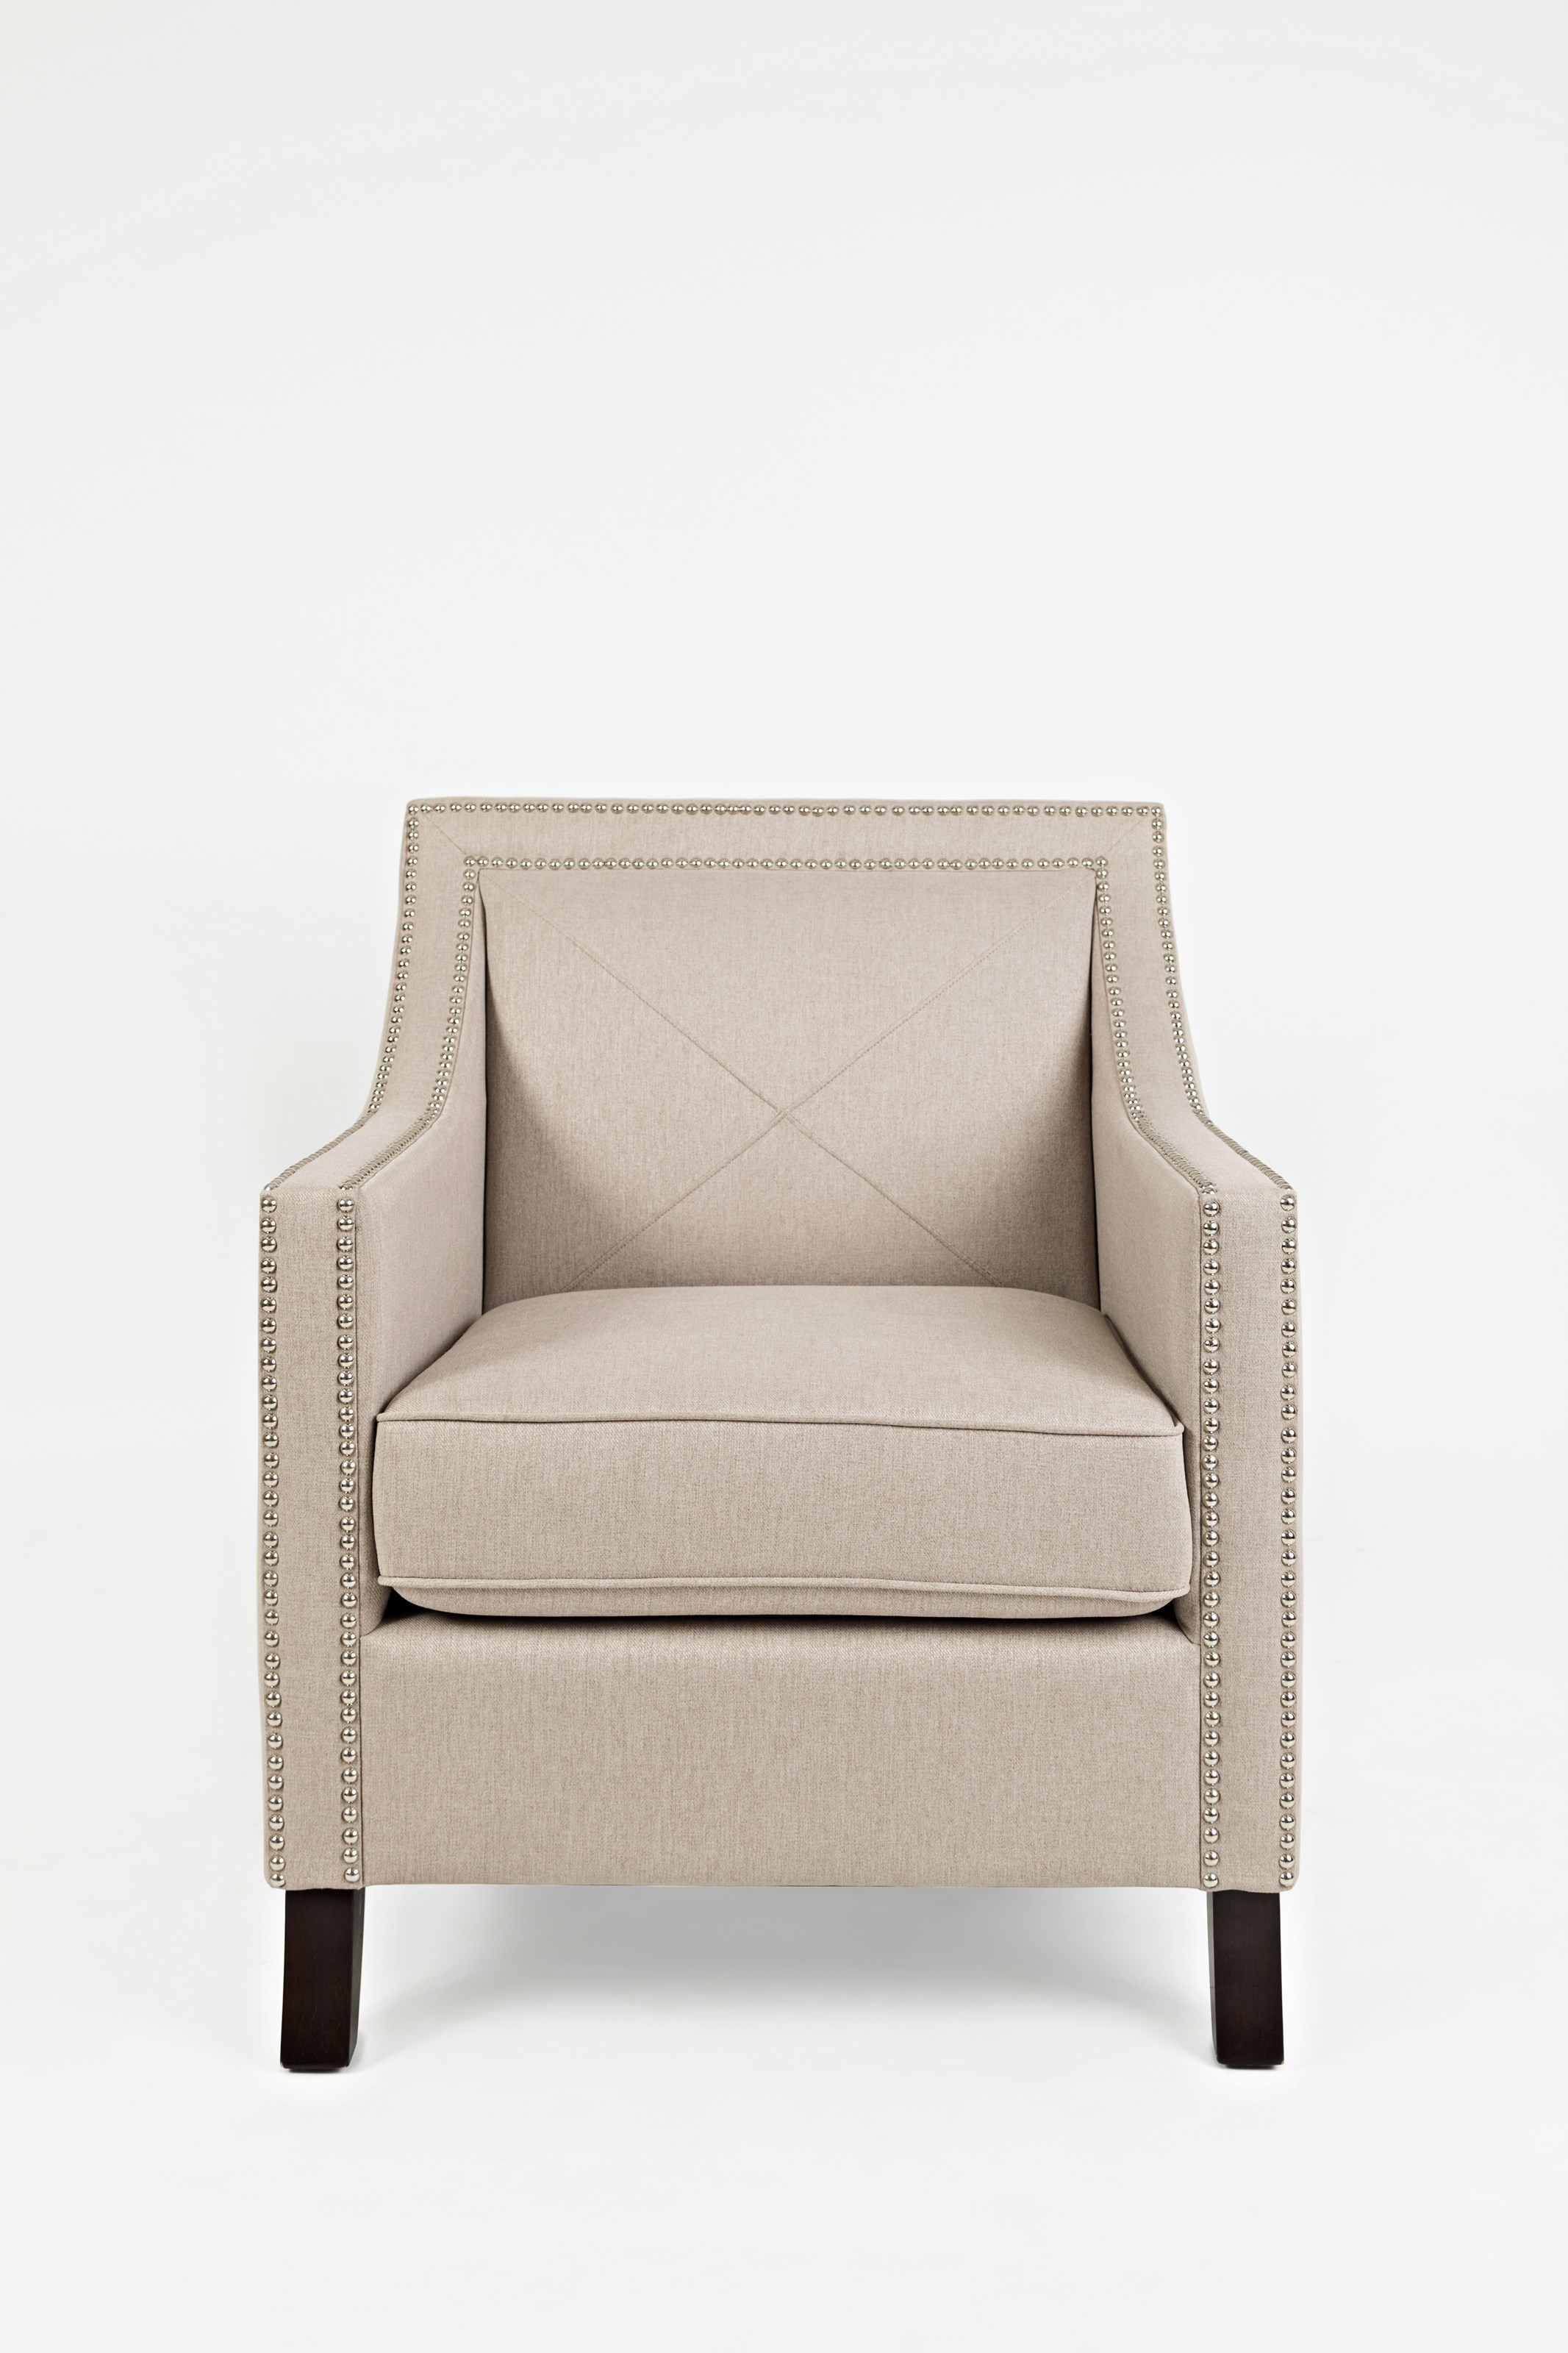 Jofran Easy Living Luca Club Chair With Nail Head Trim